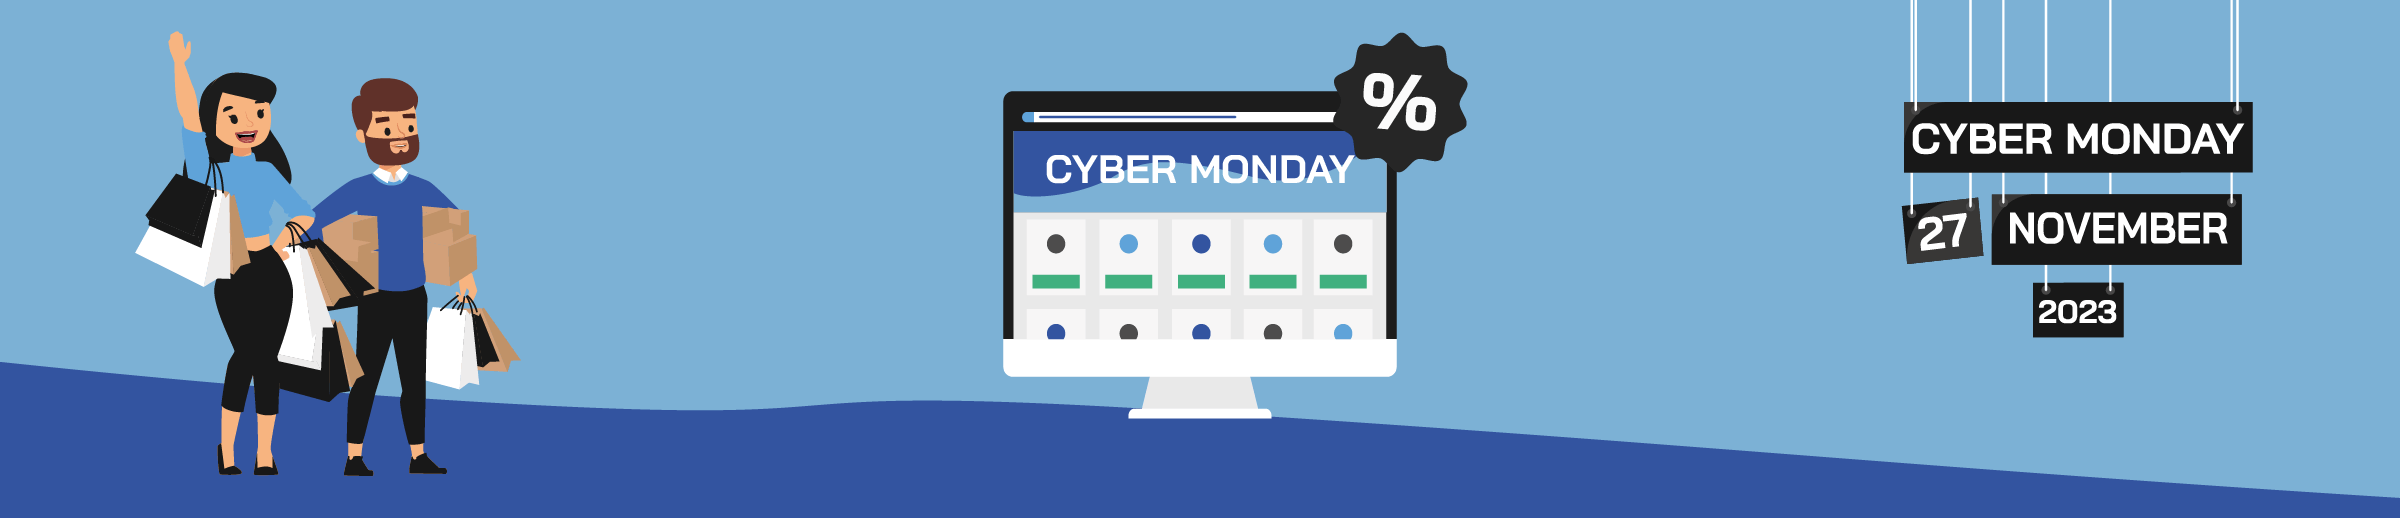 Cyber Monday 2023